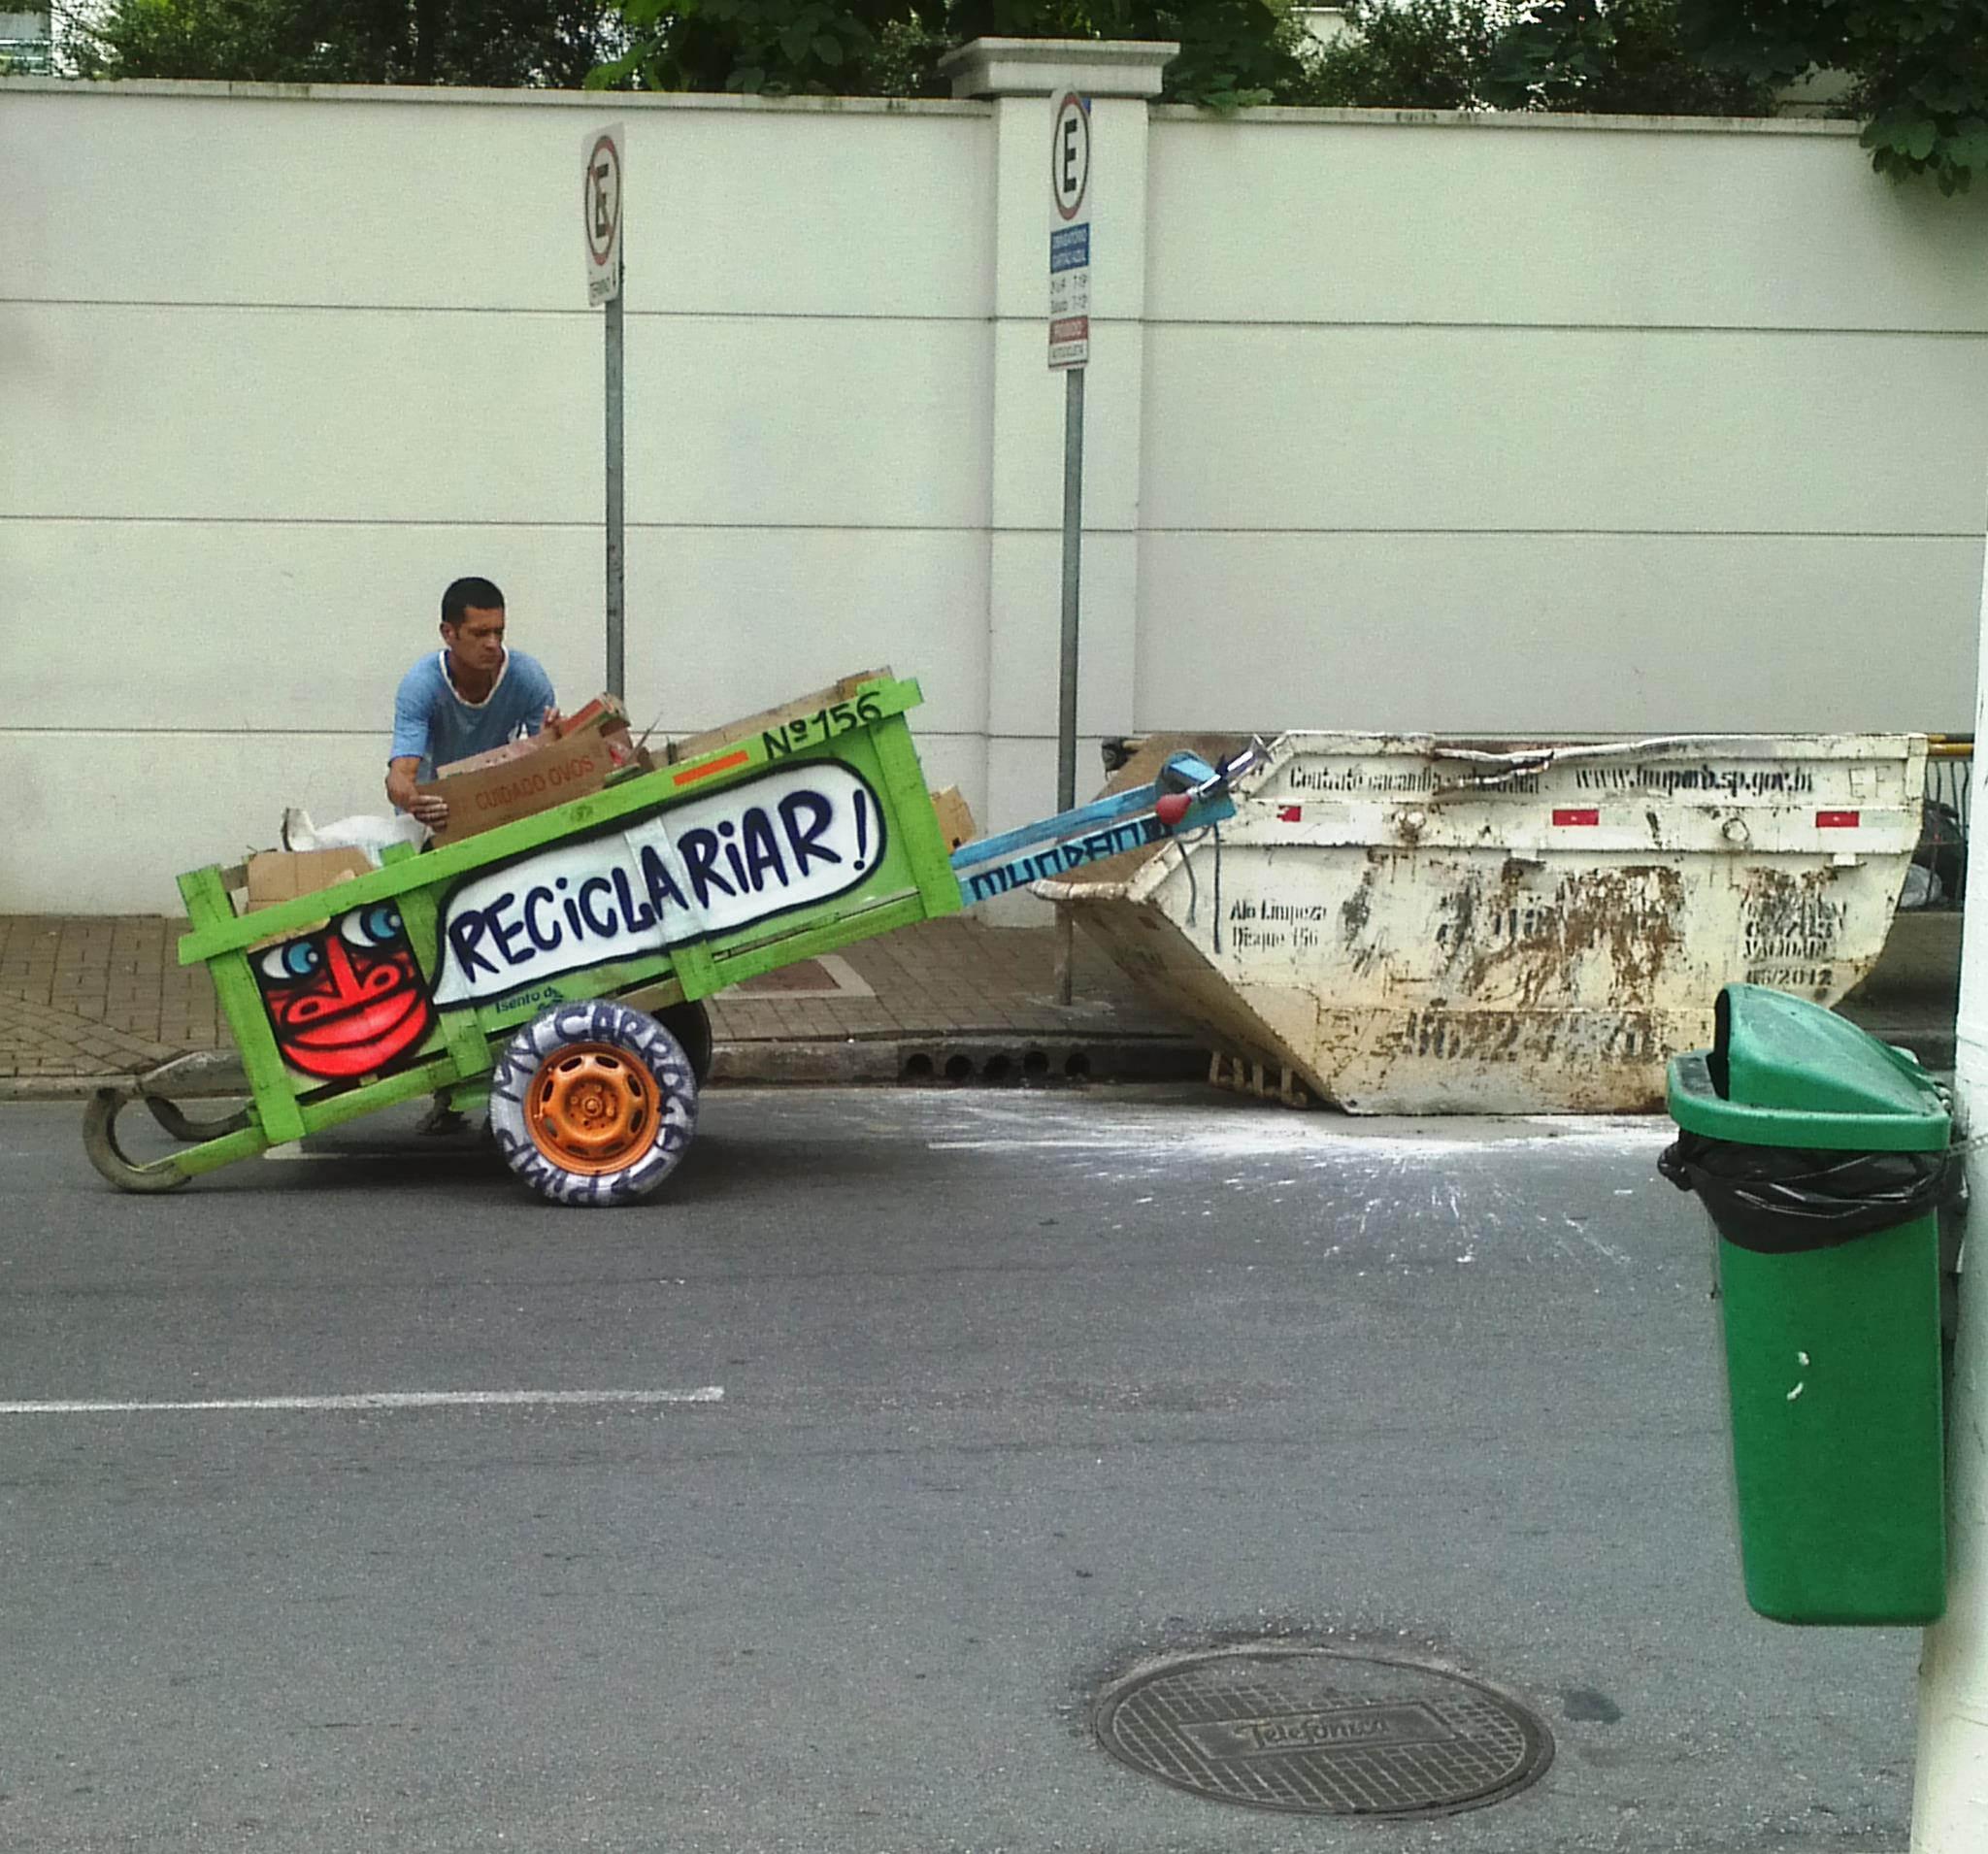 pimp-my-carroça-mundano-social-arte-ambiental-3